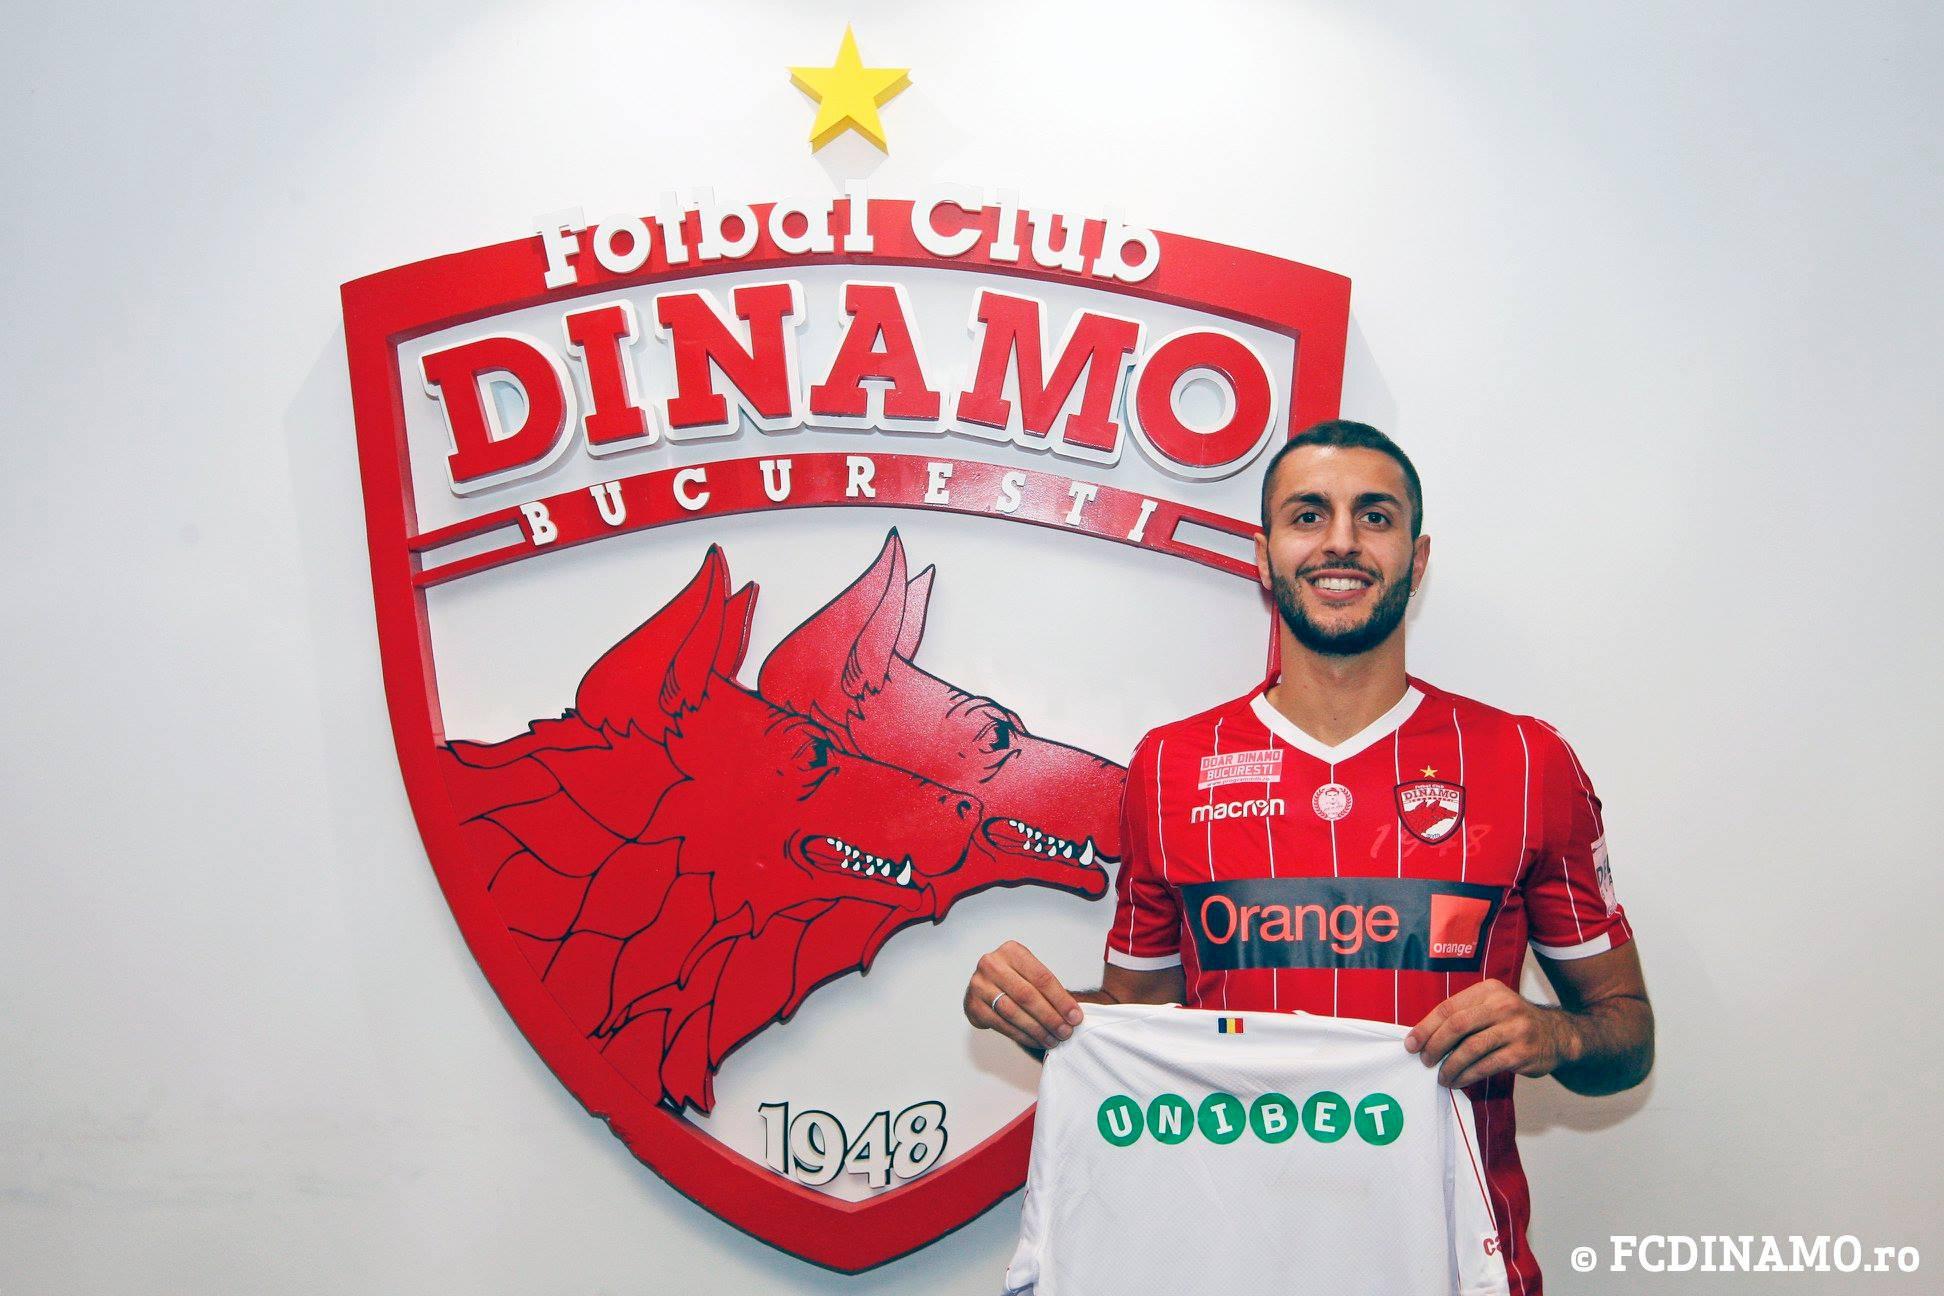 Montini Dinamo